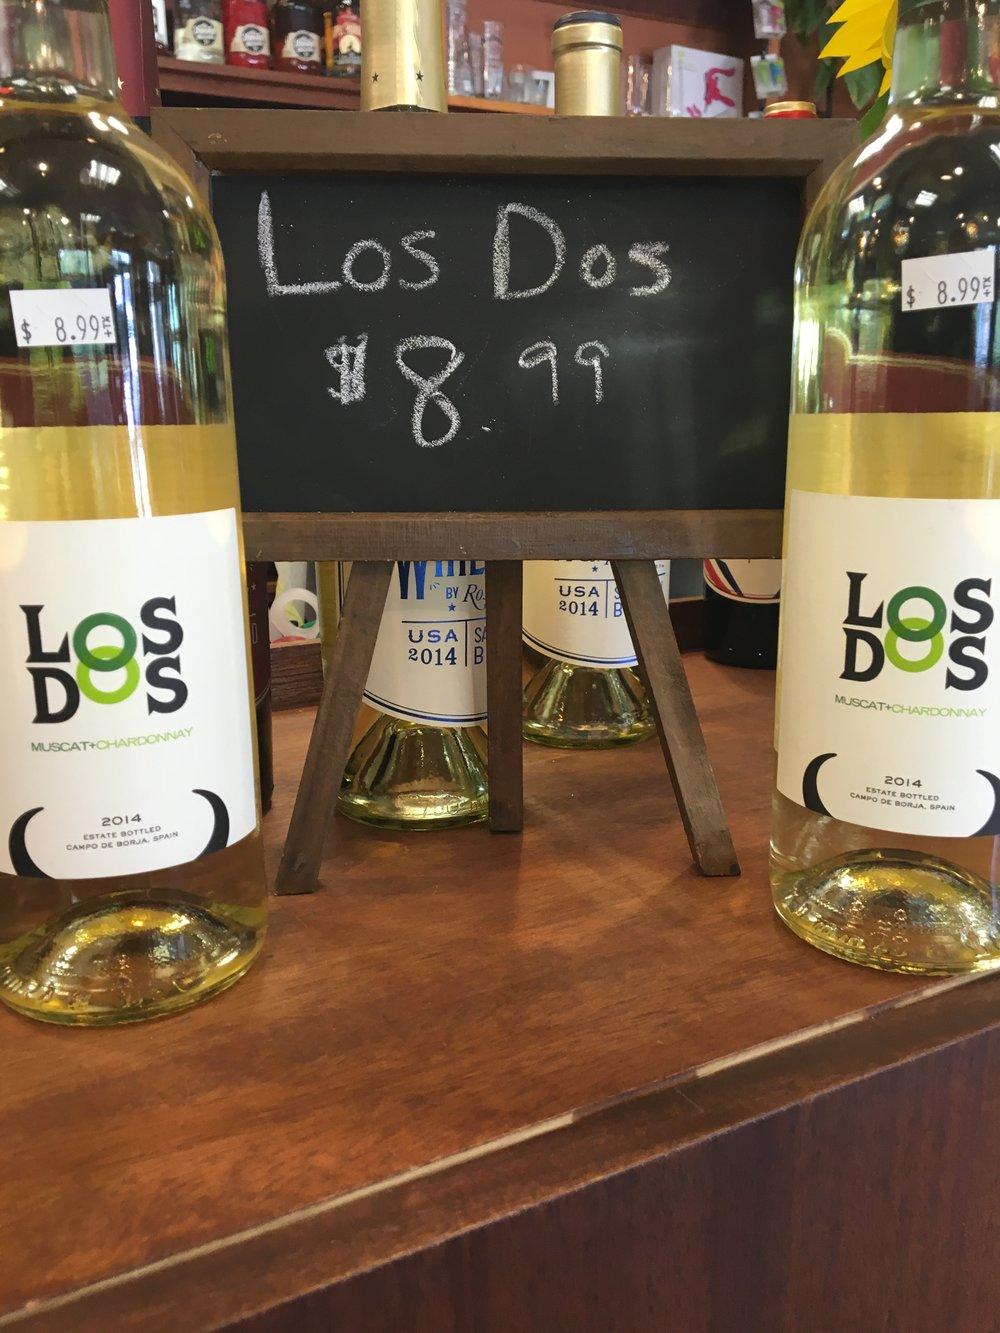 Los Dos Muscadet/Chardonnay $8.99